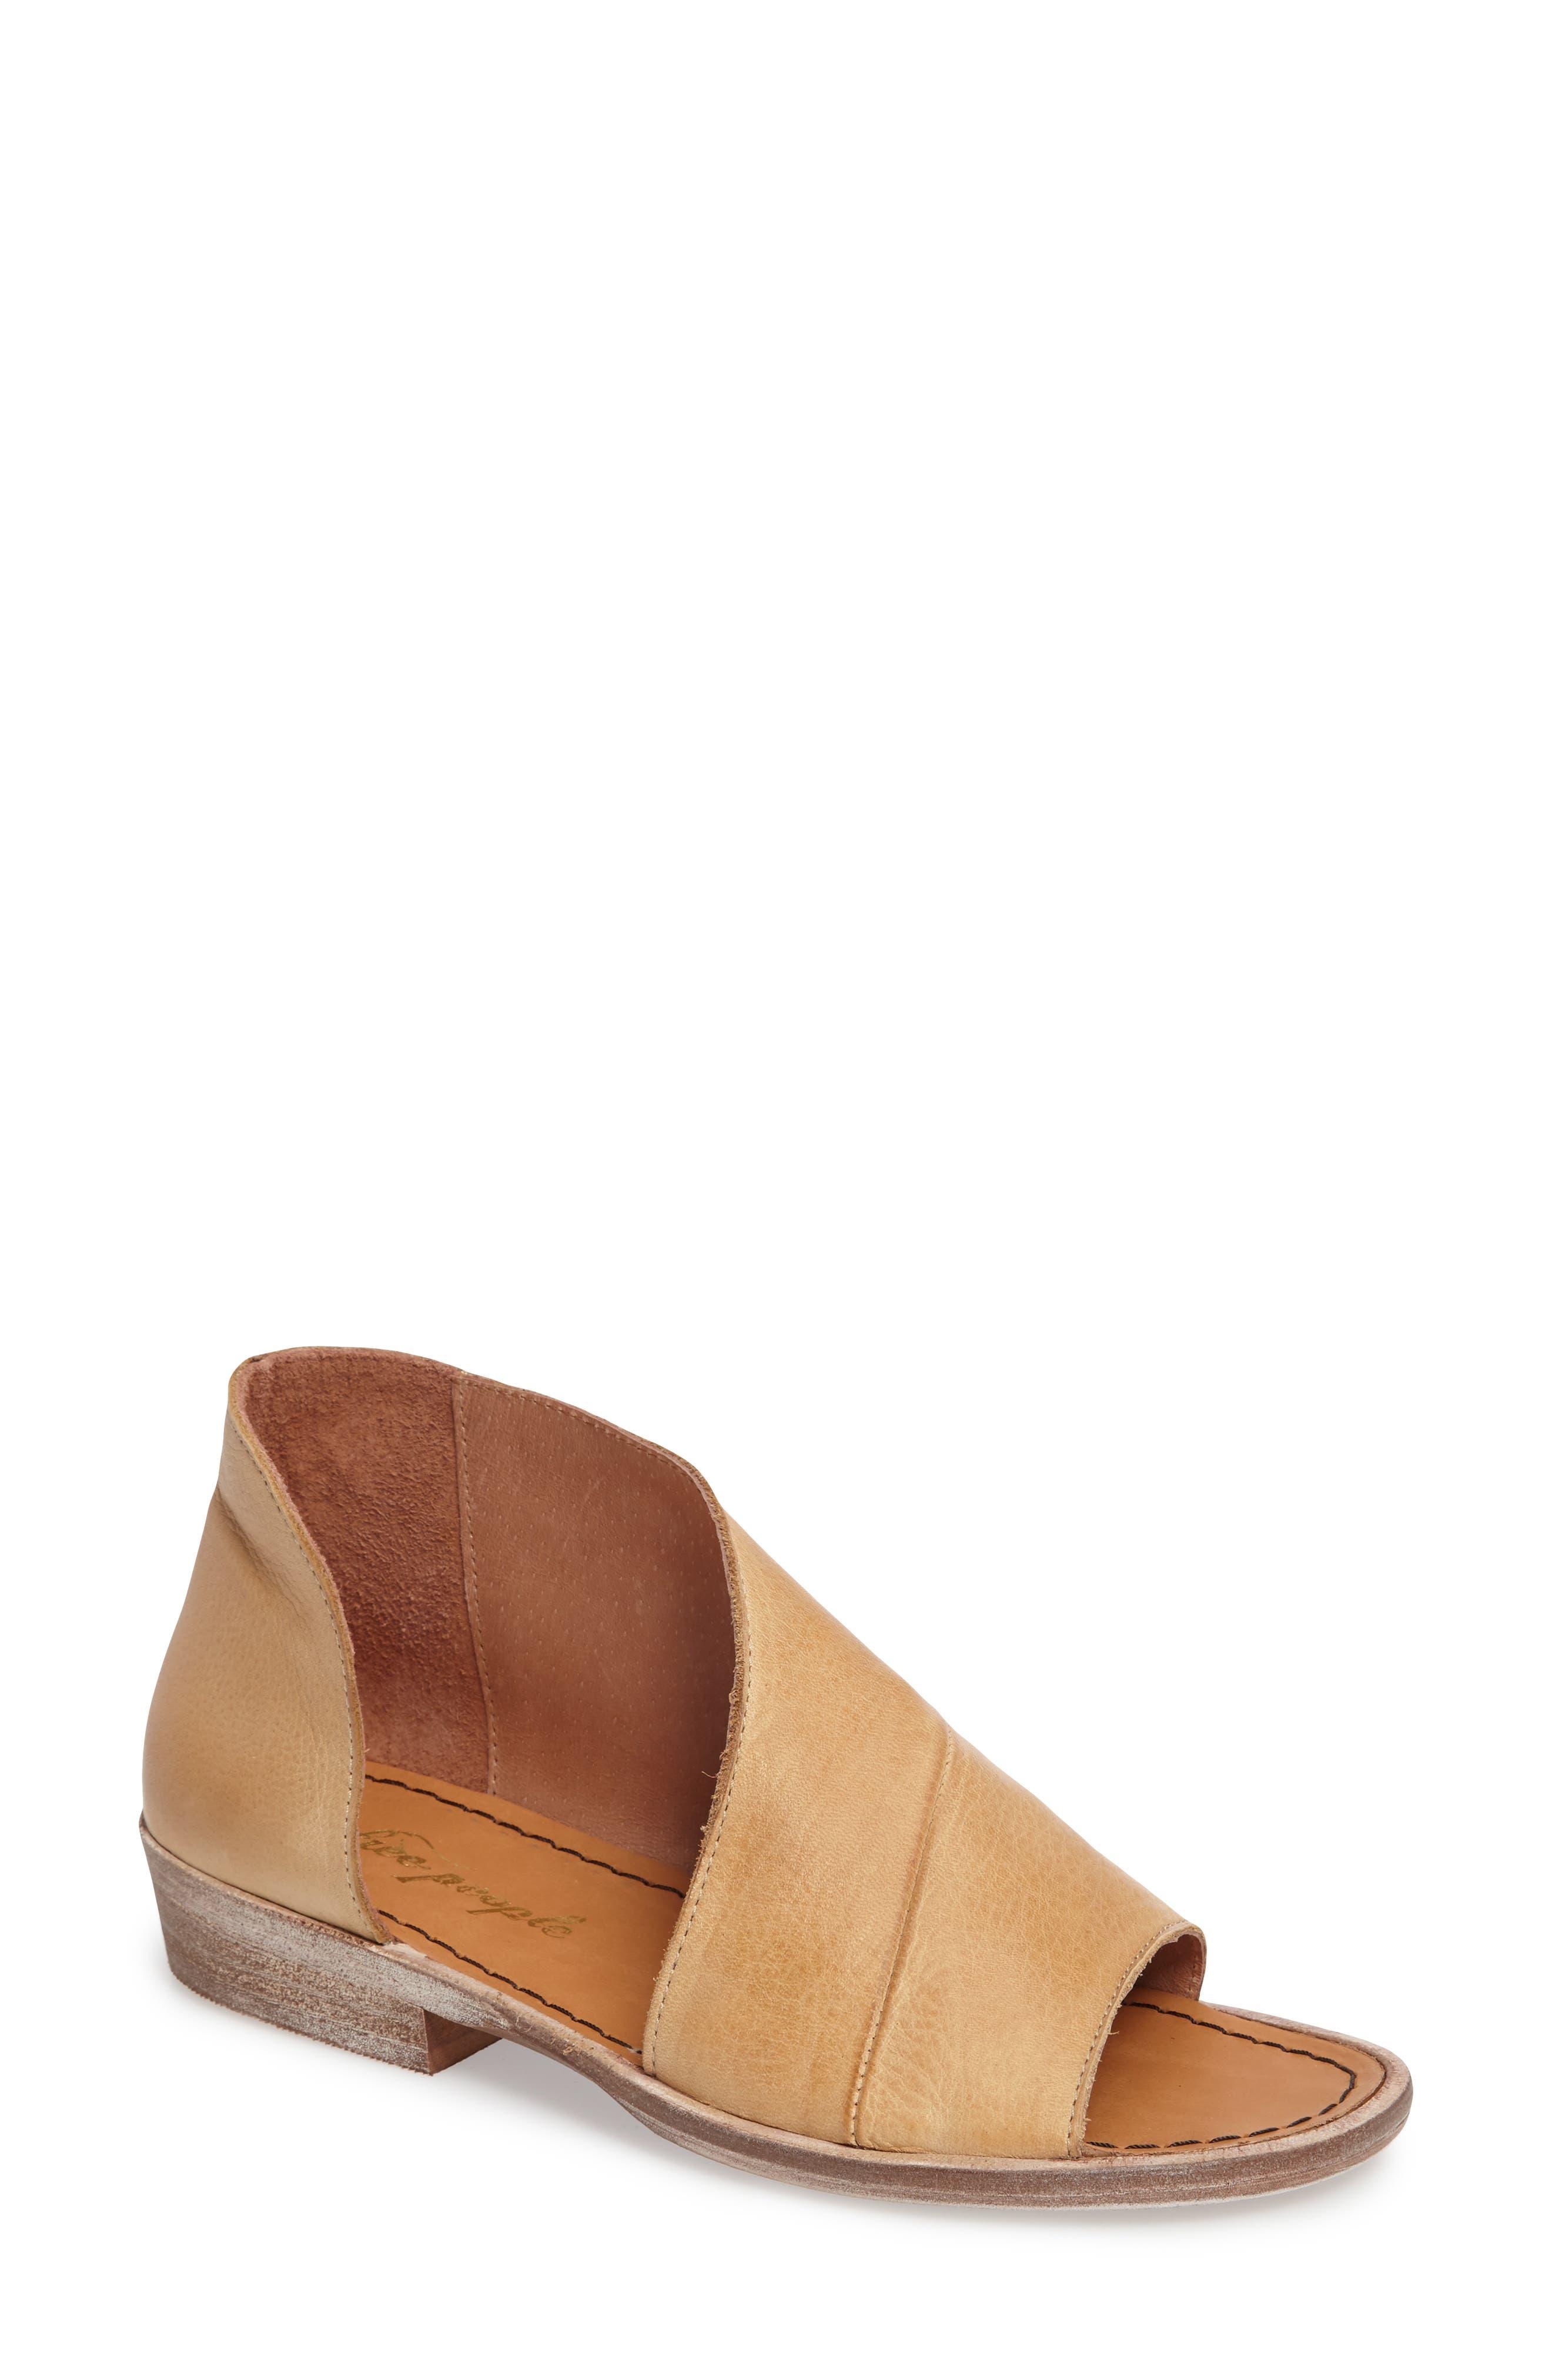 'Mont Blanc' Asymmetrical Sandal,                             Main thumbnail 12, color,